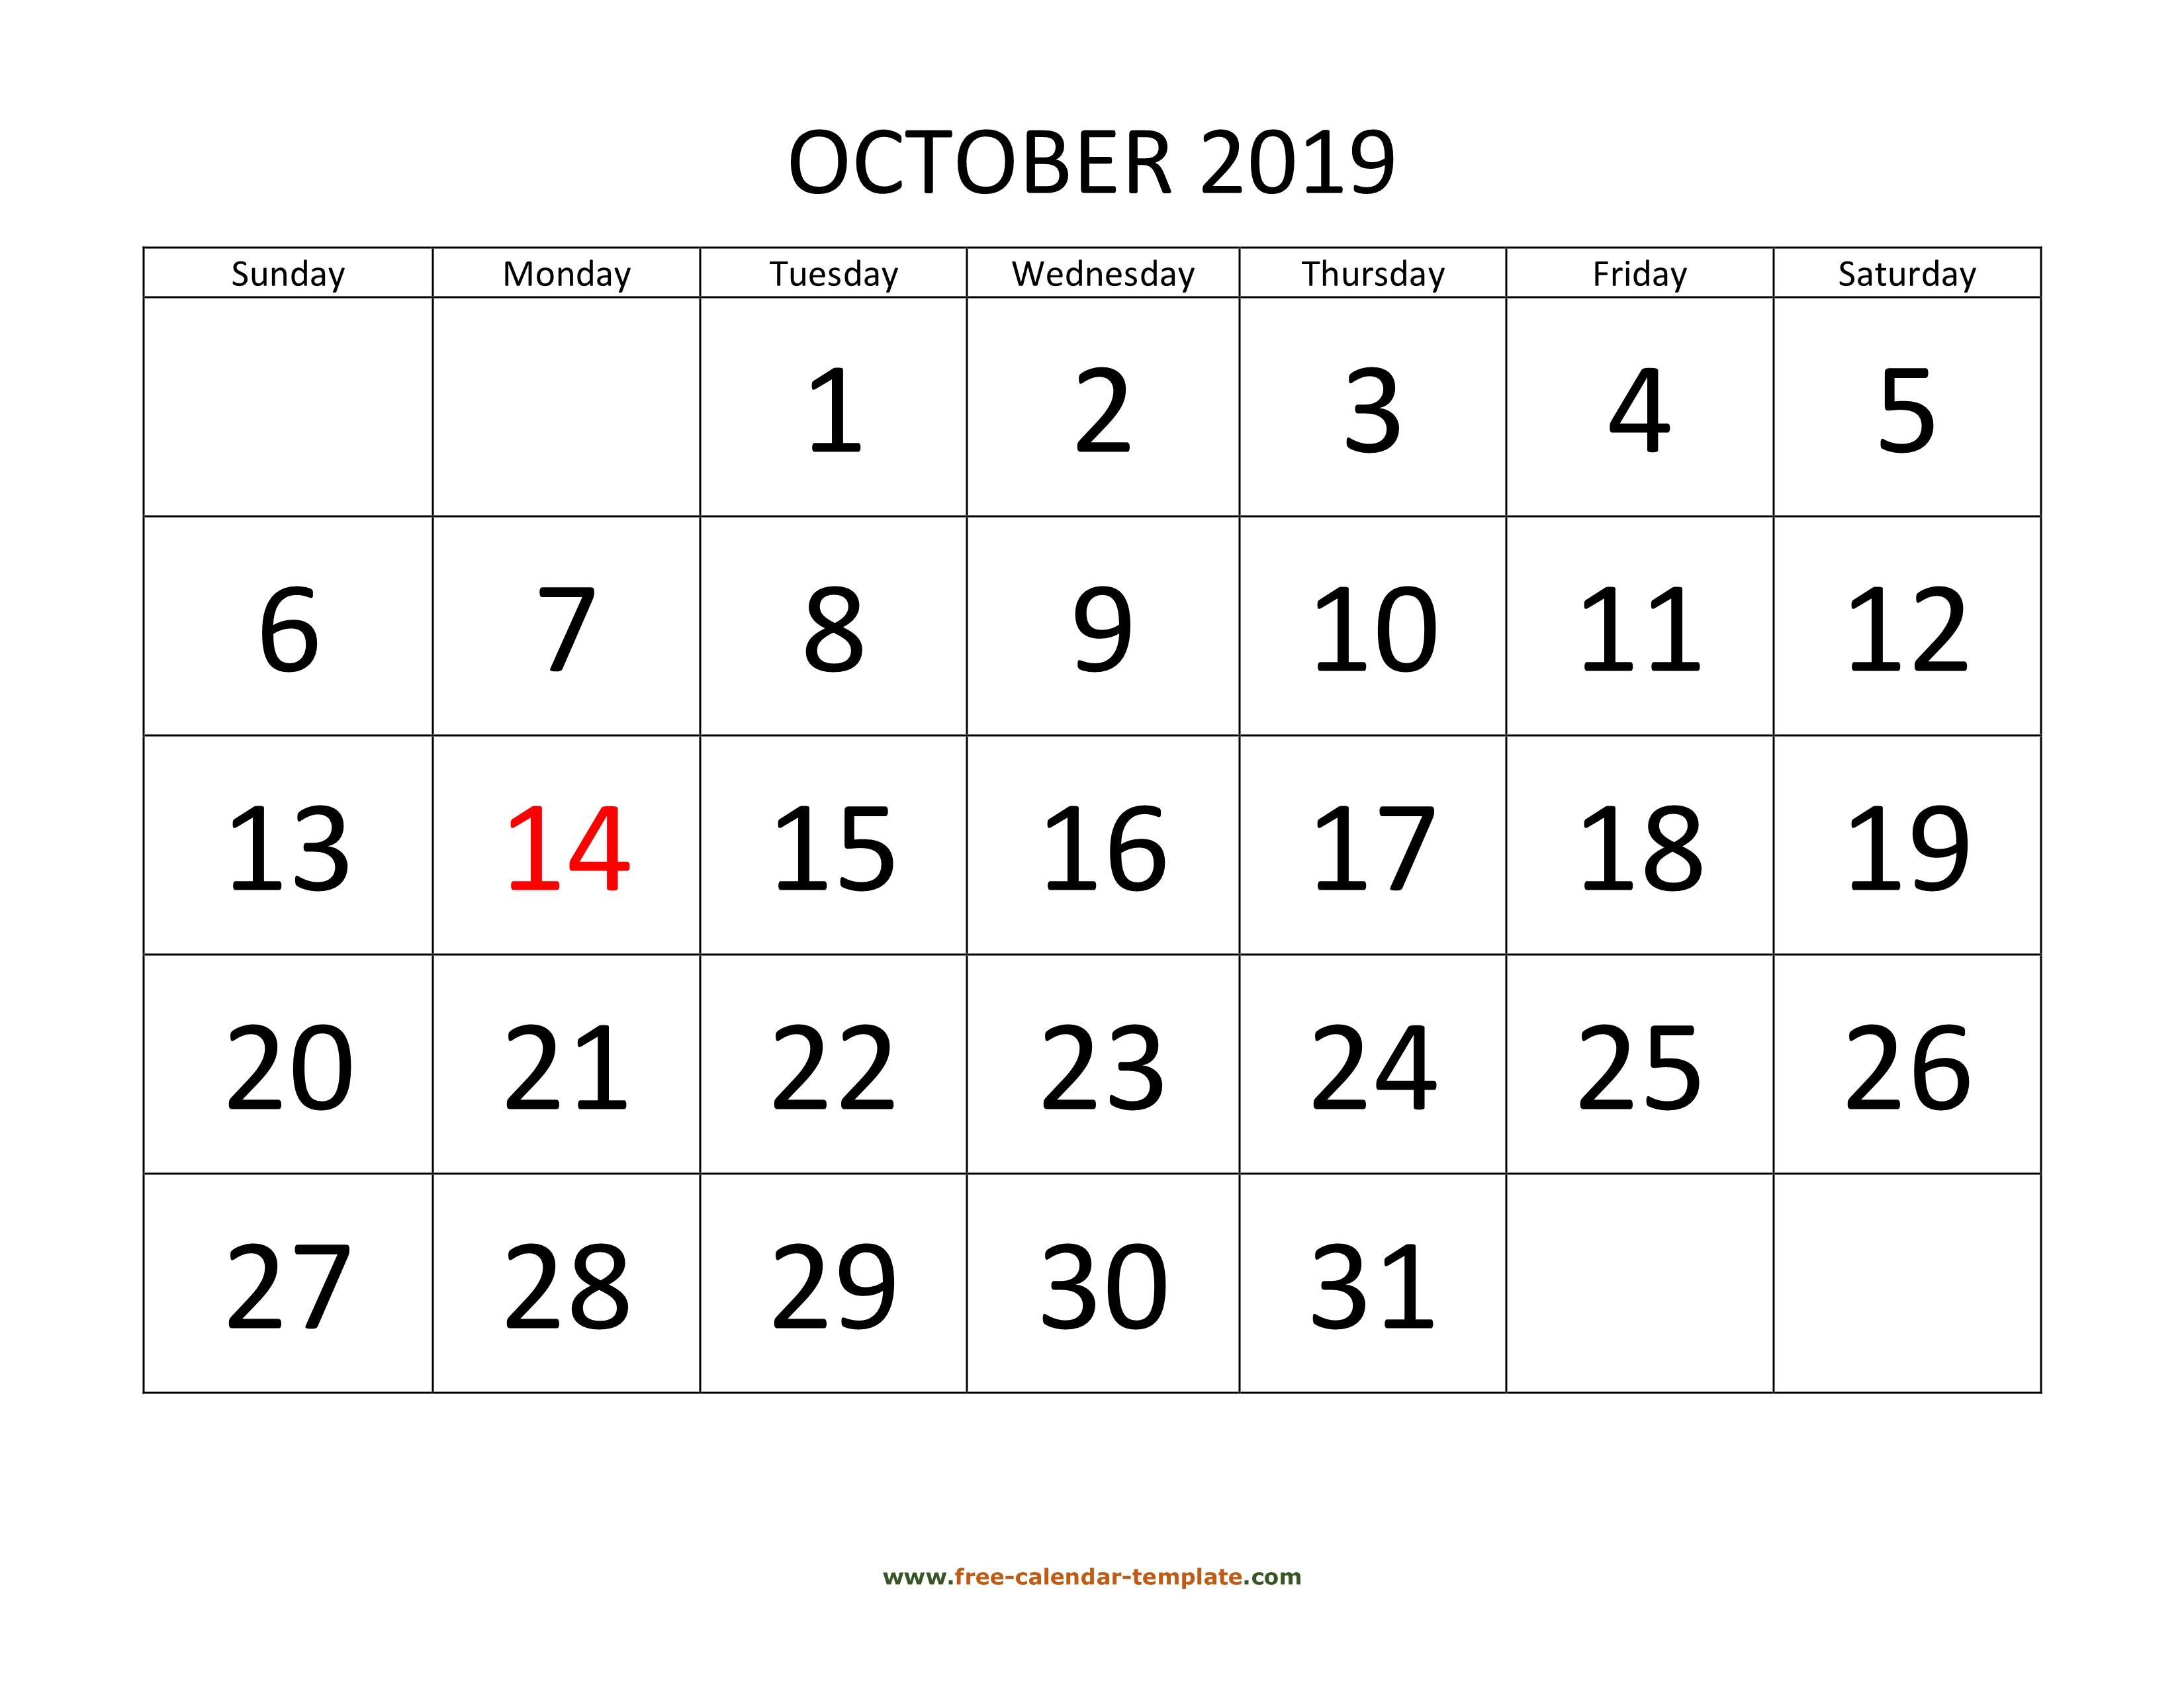 October 2019 Free Calendar Tempplate | Freecalendar pertaining to Monday Through Friday Calendar Template Word